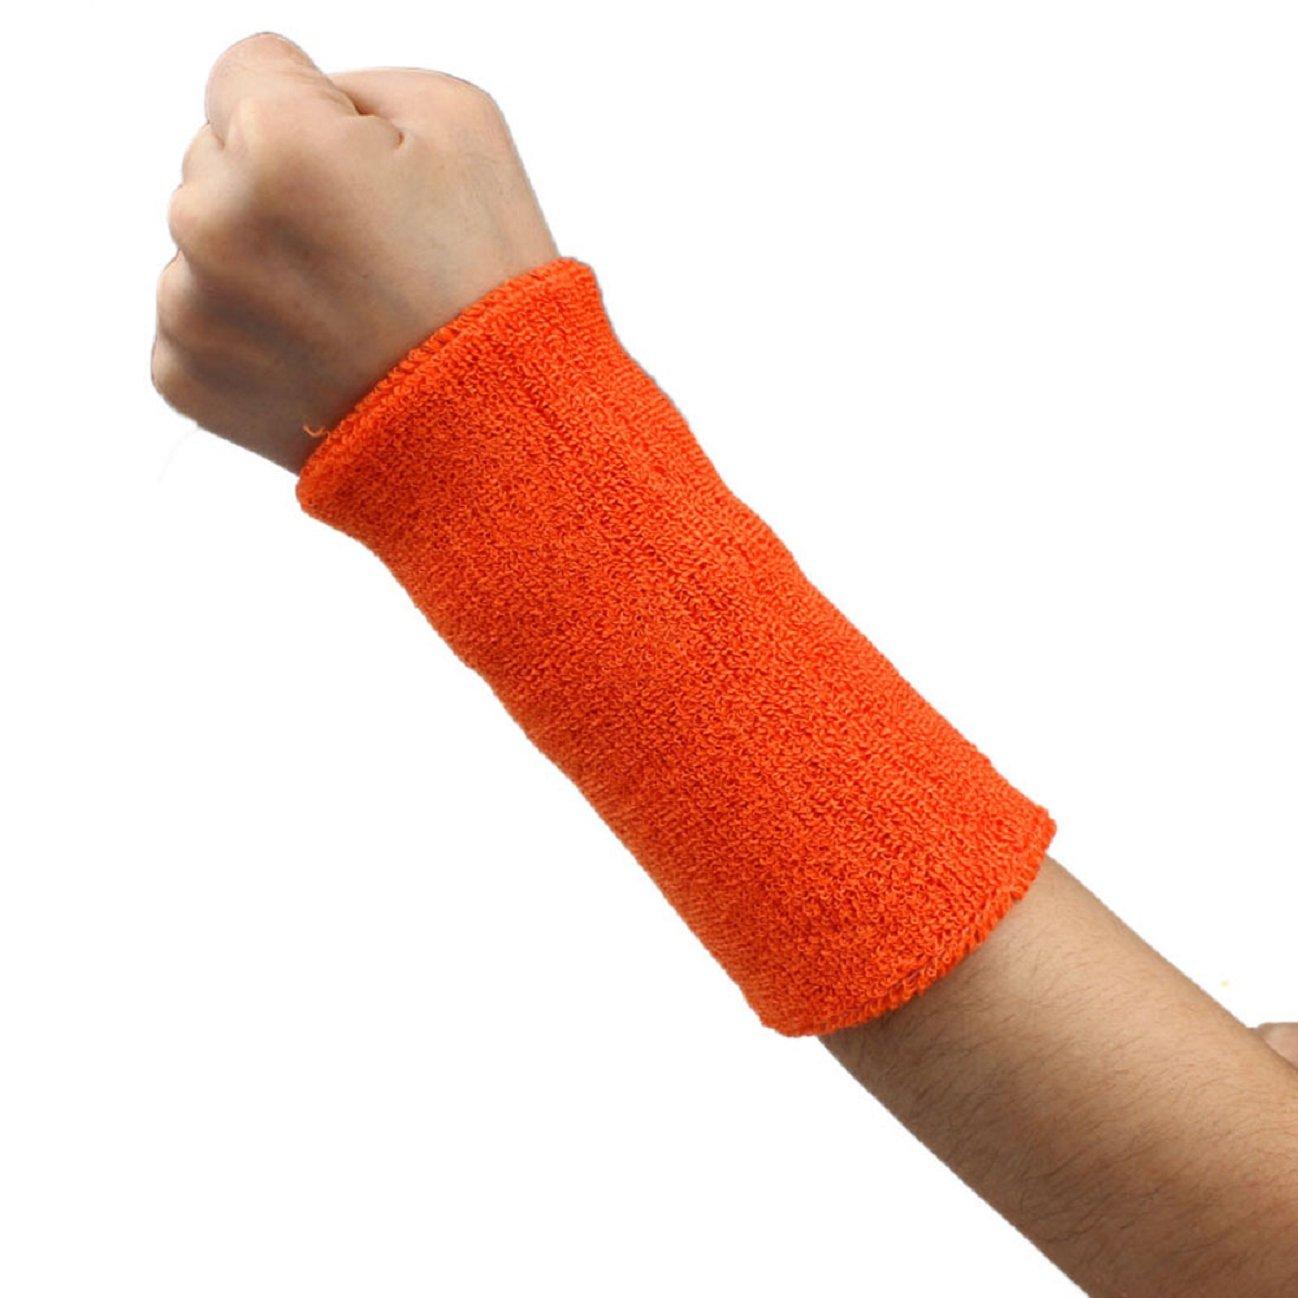 Tonsee 1 PCS Unisex Cotton Basketball Tennis Gym Yoga Sweatband Wristband (Orange)